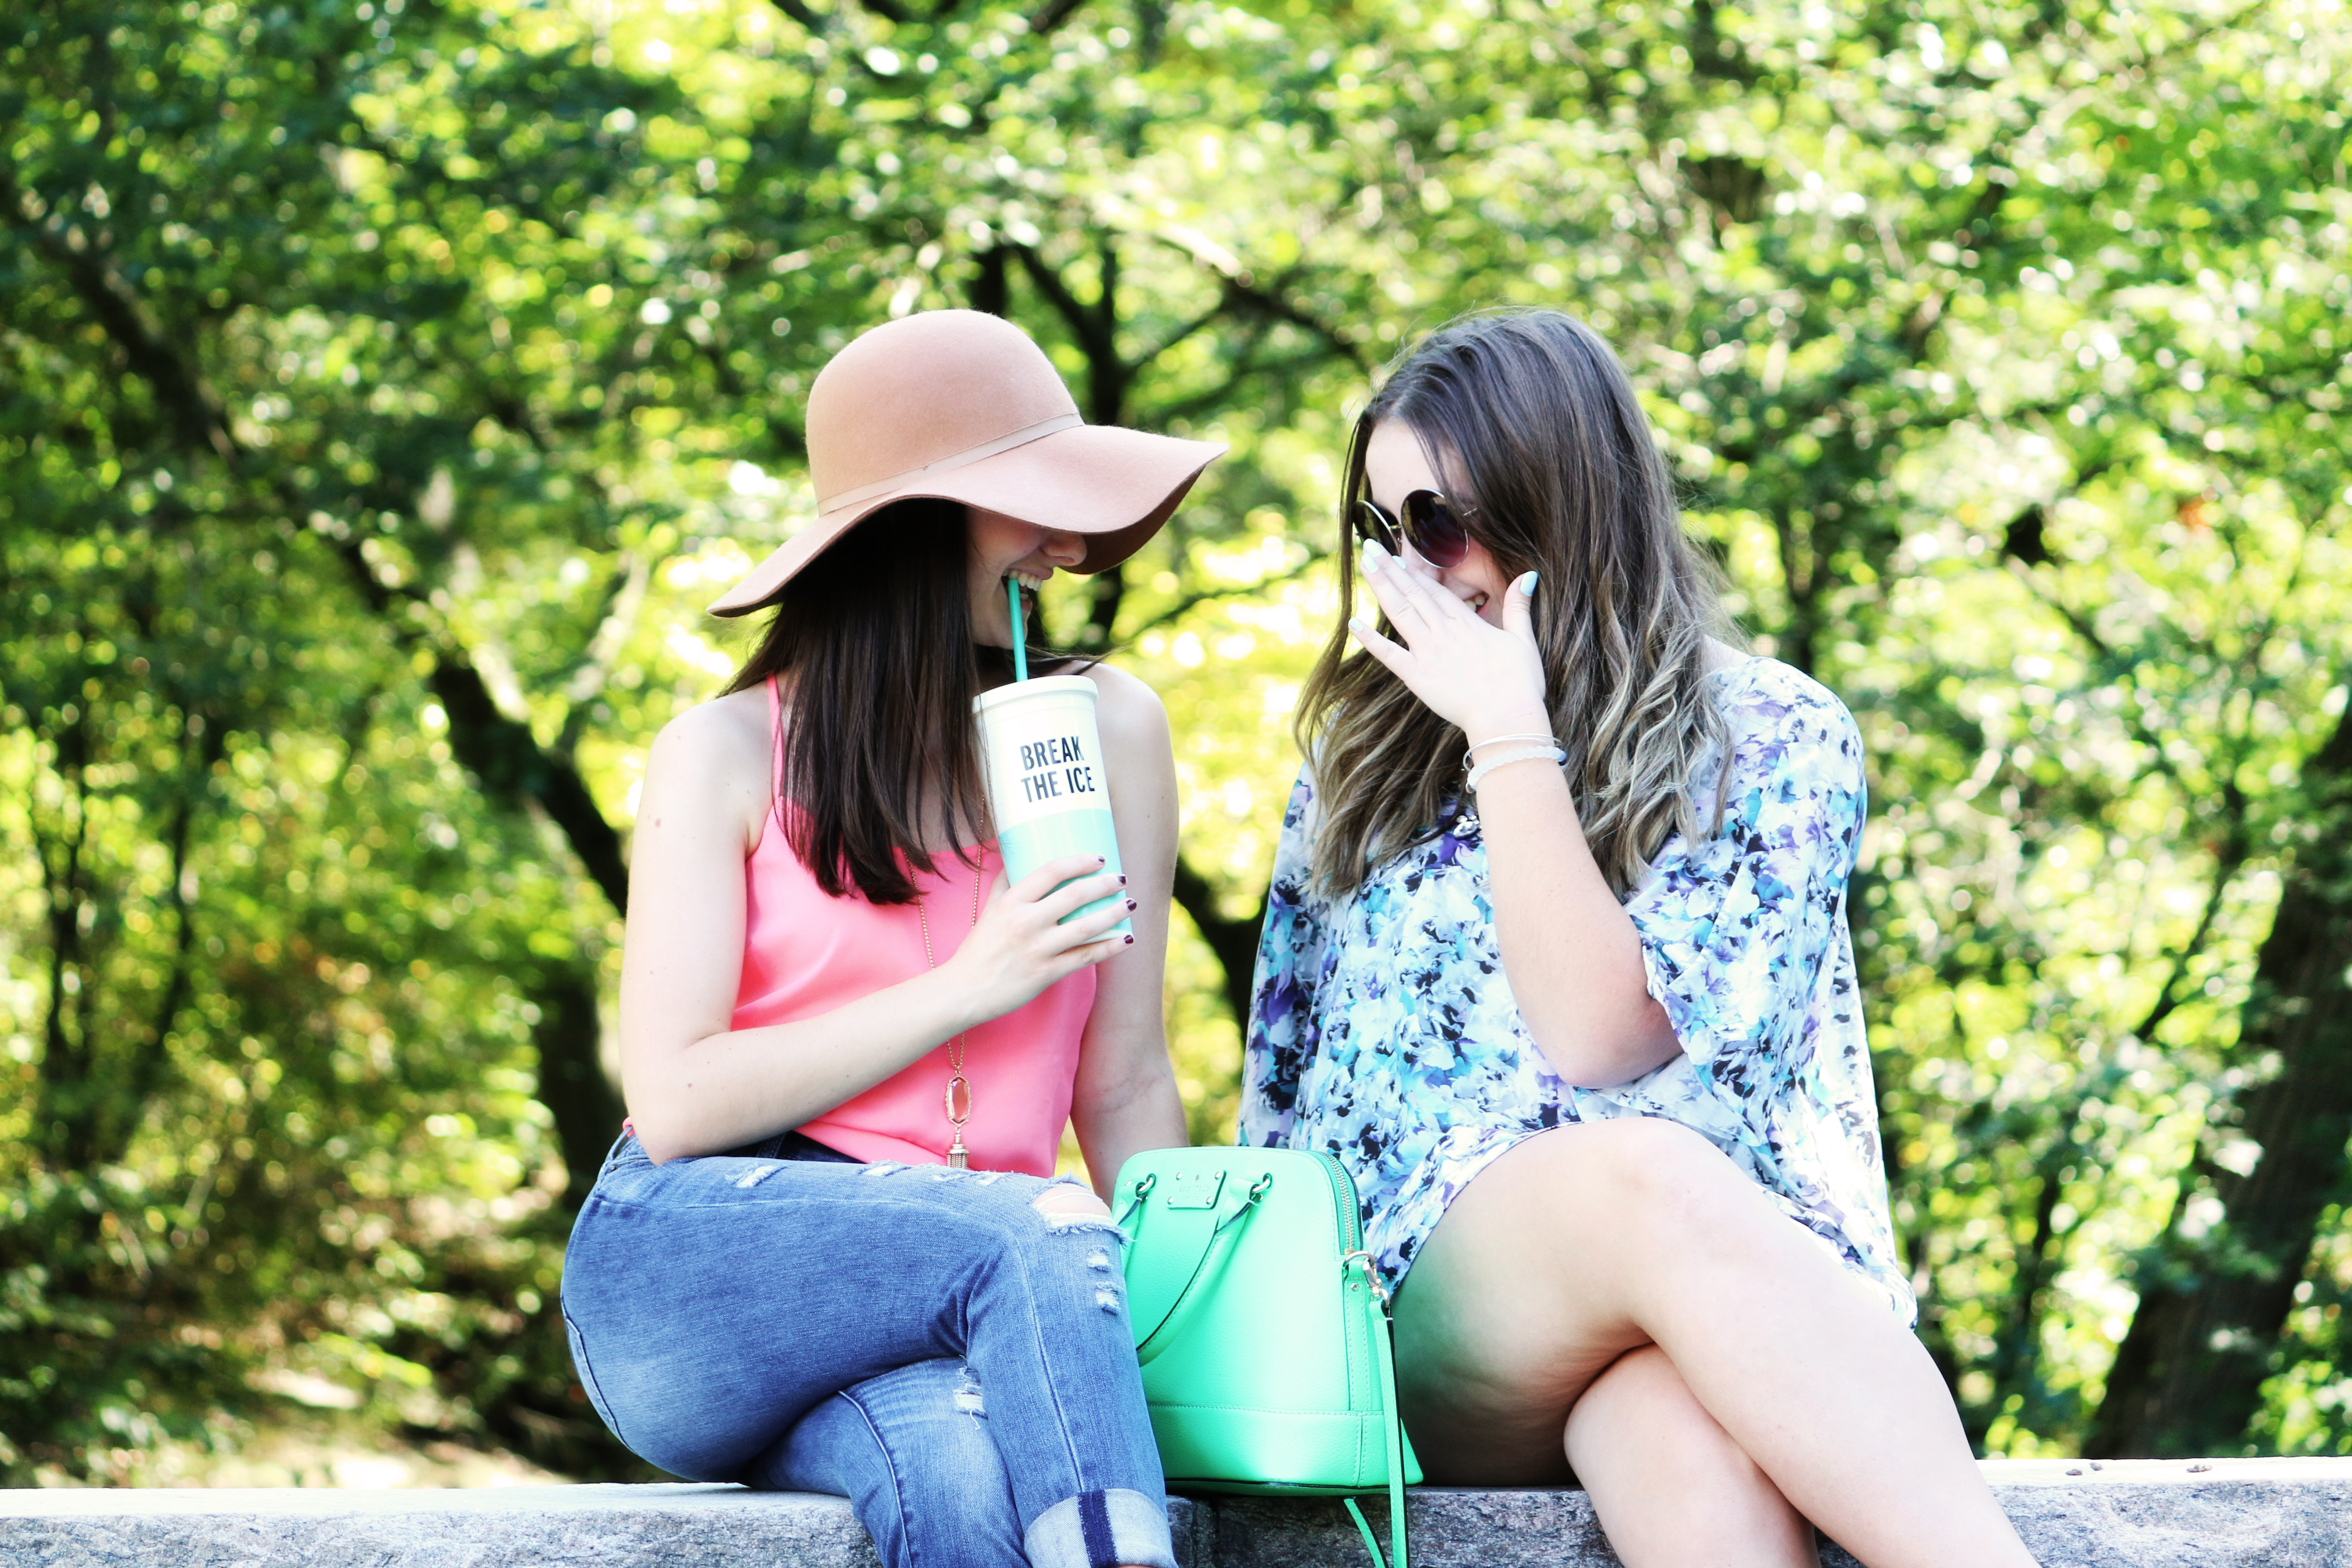 girls-sharing-secret